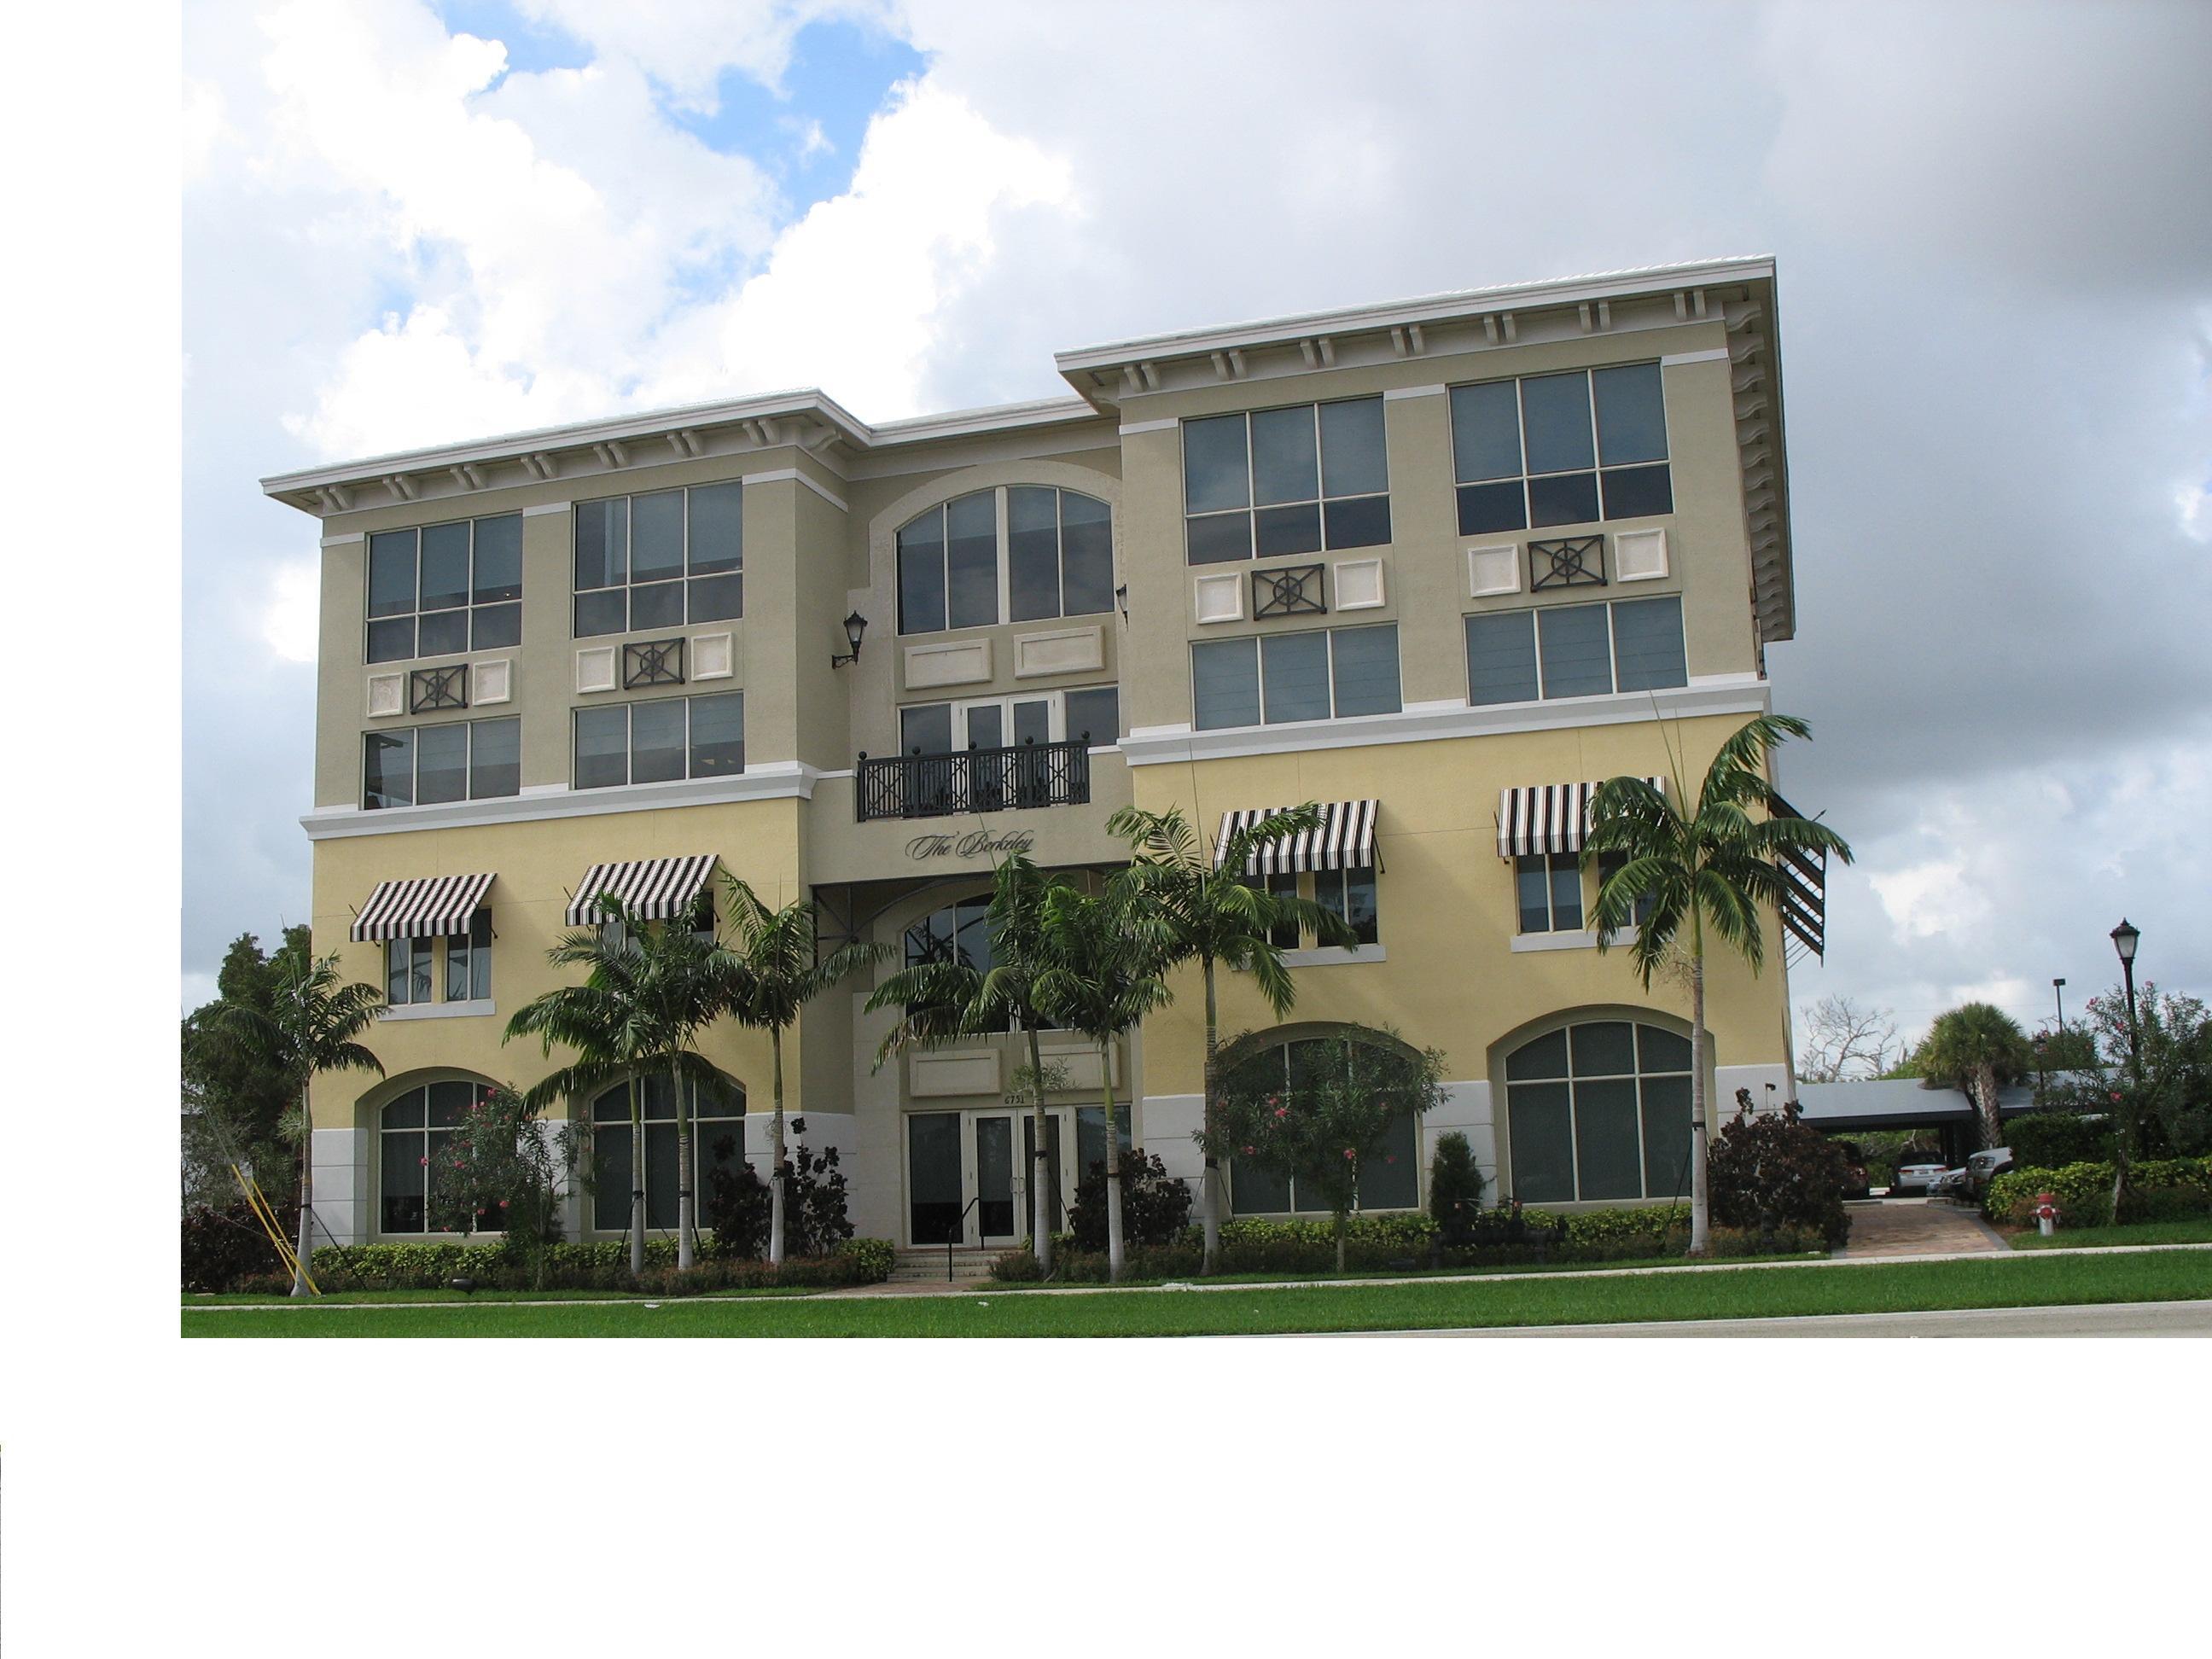 6751 N Federal Unit 400, 401, 402, 403, Boca Raton, Florida 33487